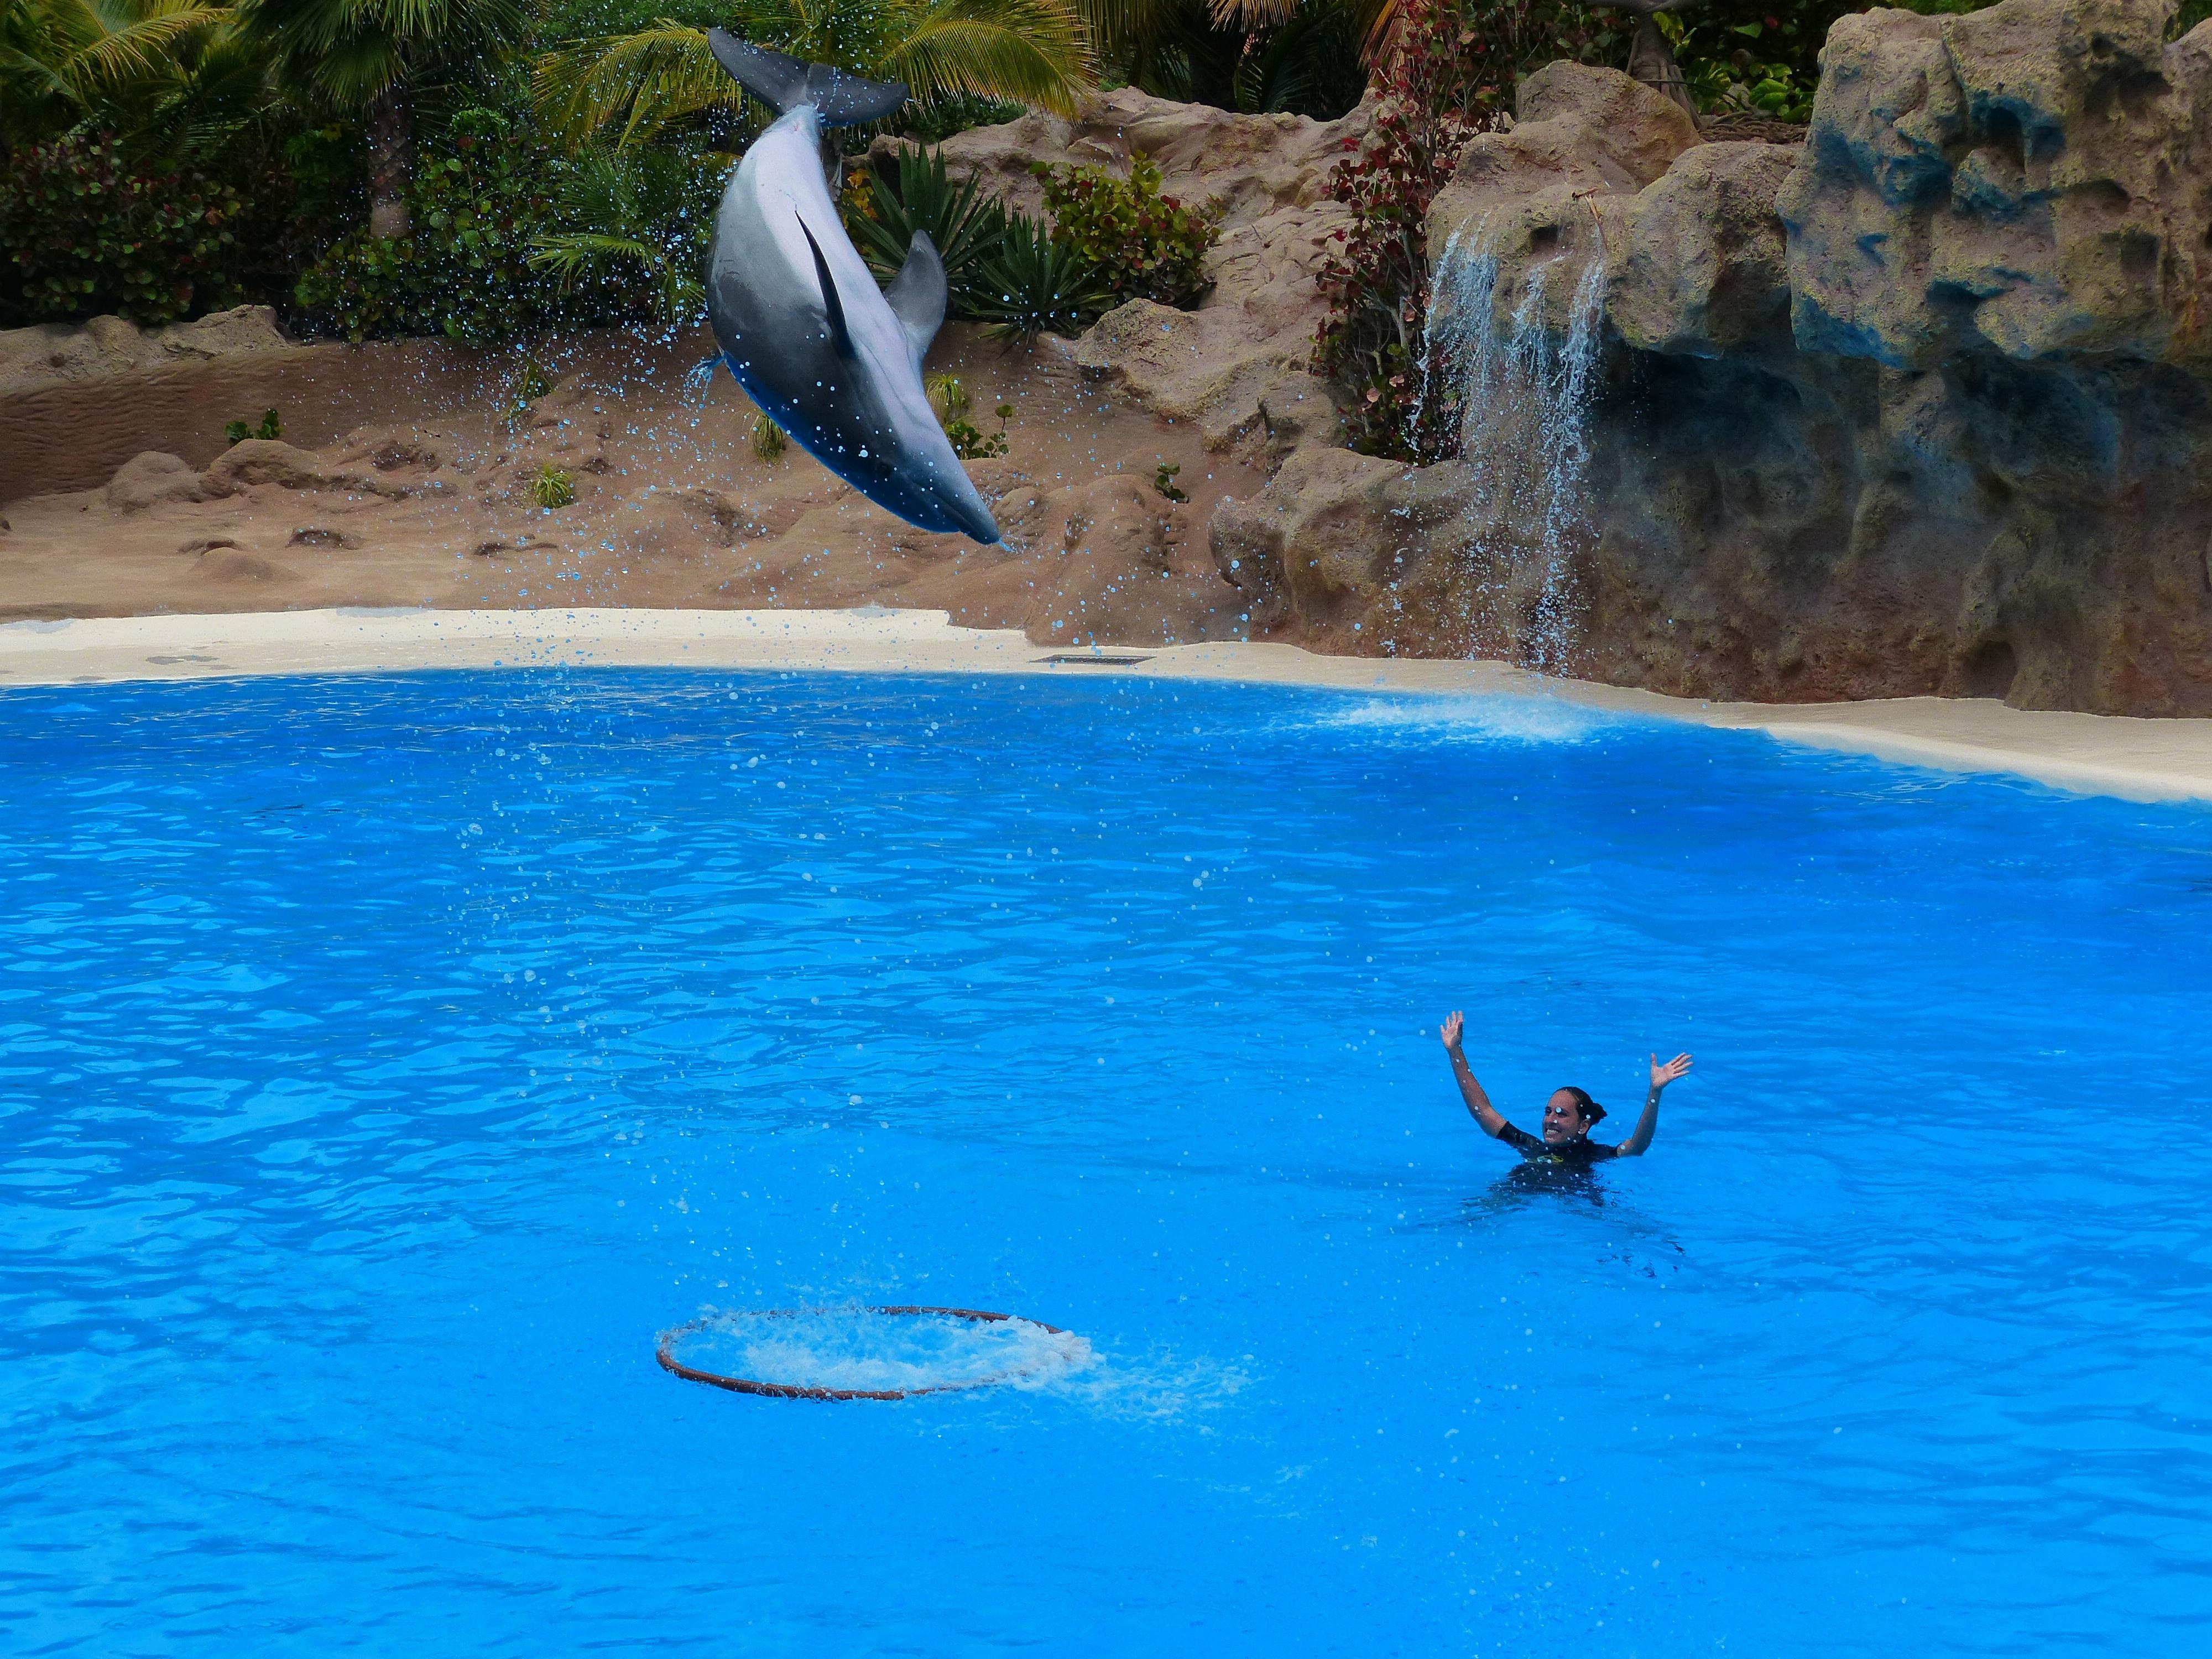 Fotos gratis mar agua anillo vacaciones alto piscina